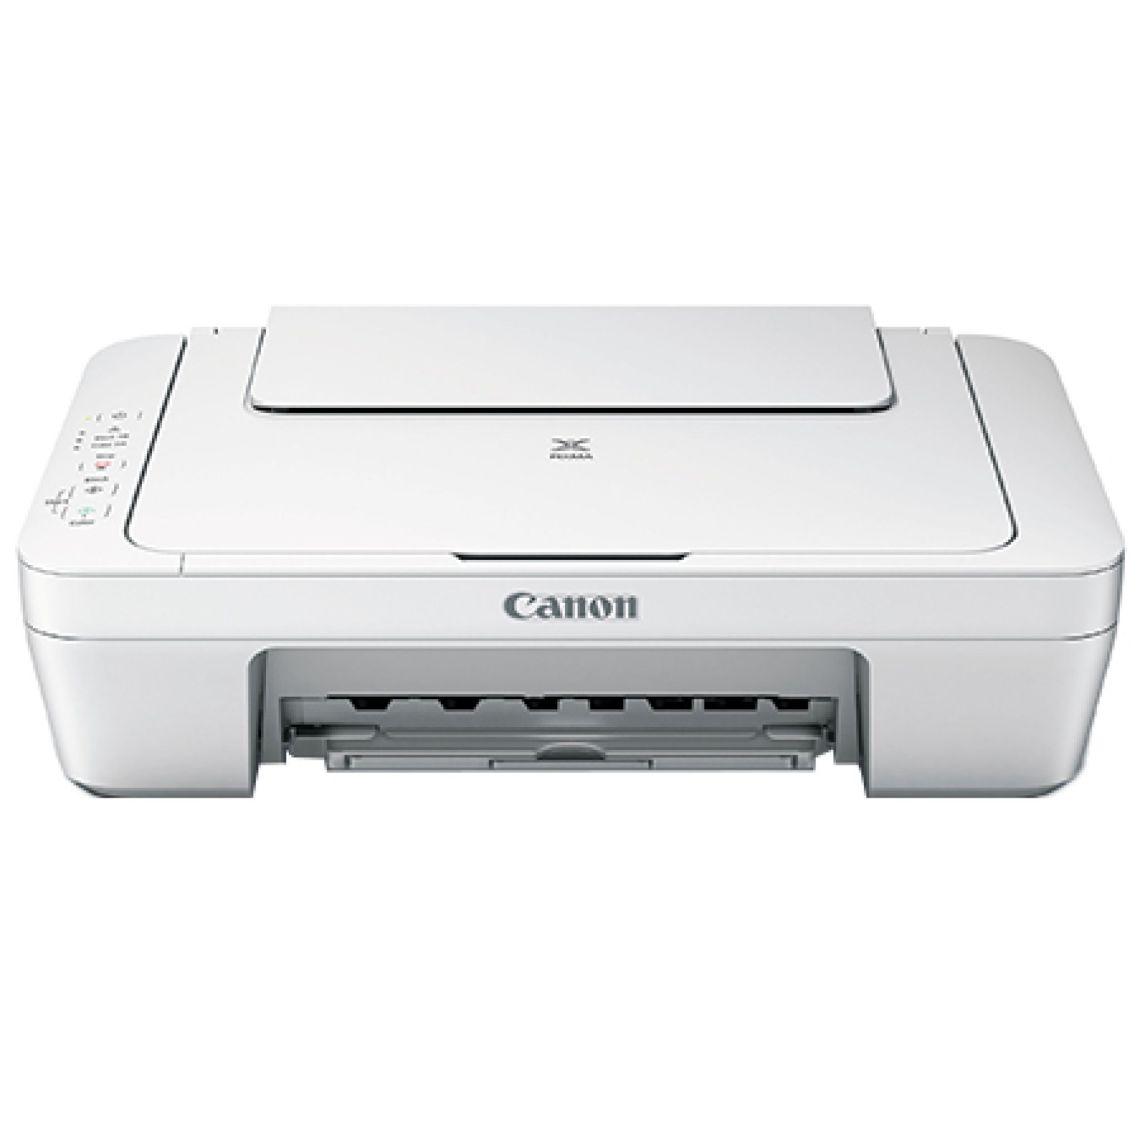 Canon PIXMA MG2522 All-in-One Inkjet Printer - Walmart.com